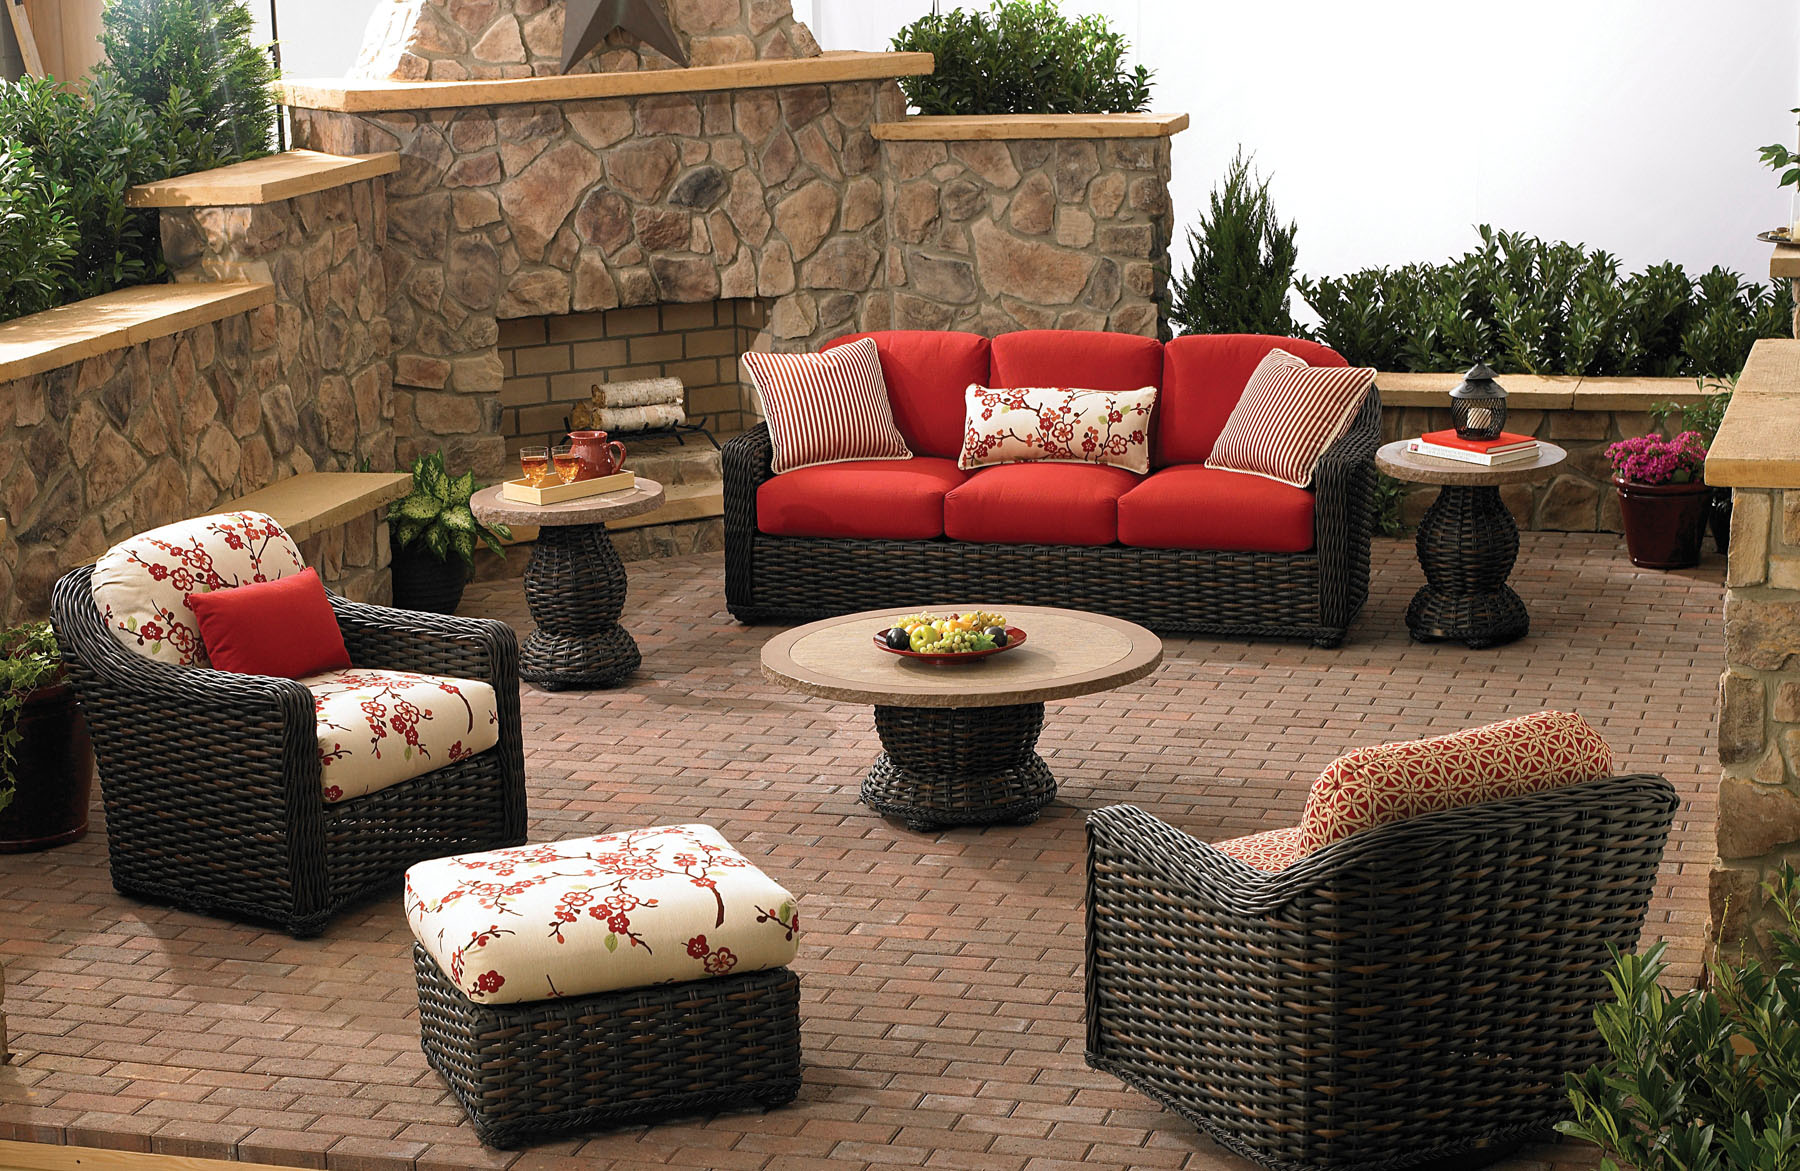 outdoor furniture amp patio furniture sets in carefree az Backyard Outdoor Furniture id=12405